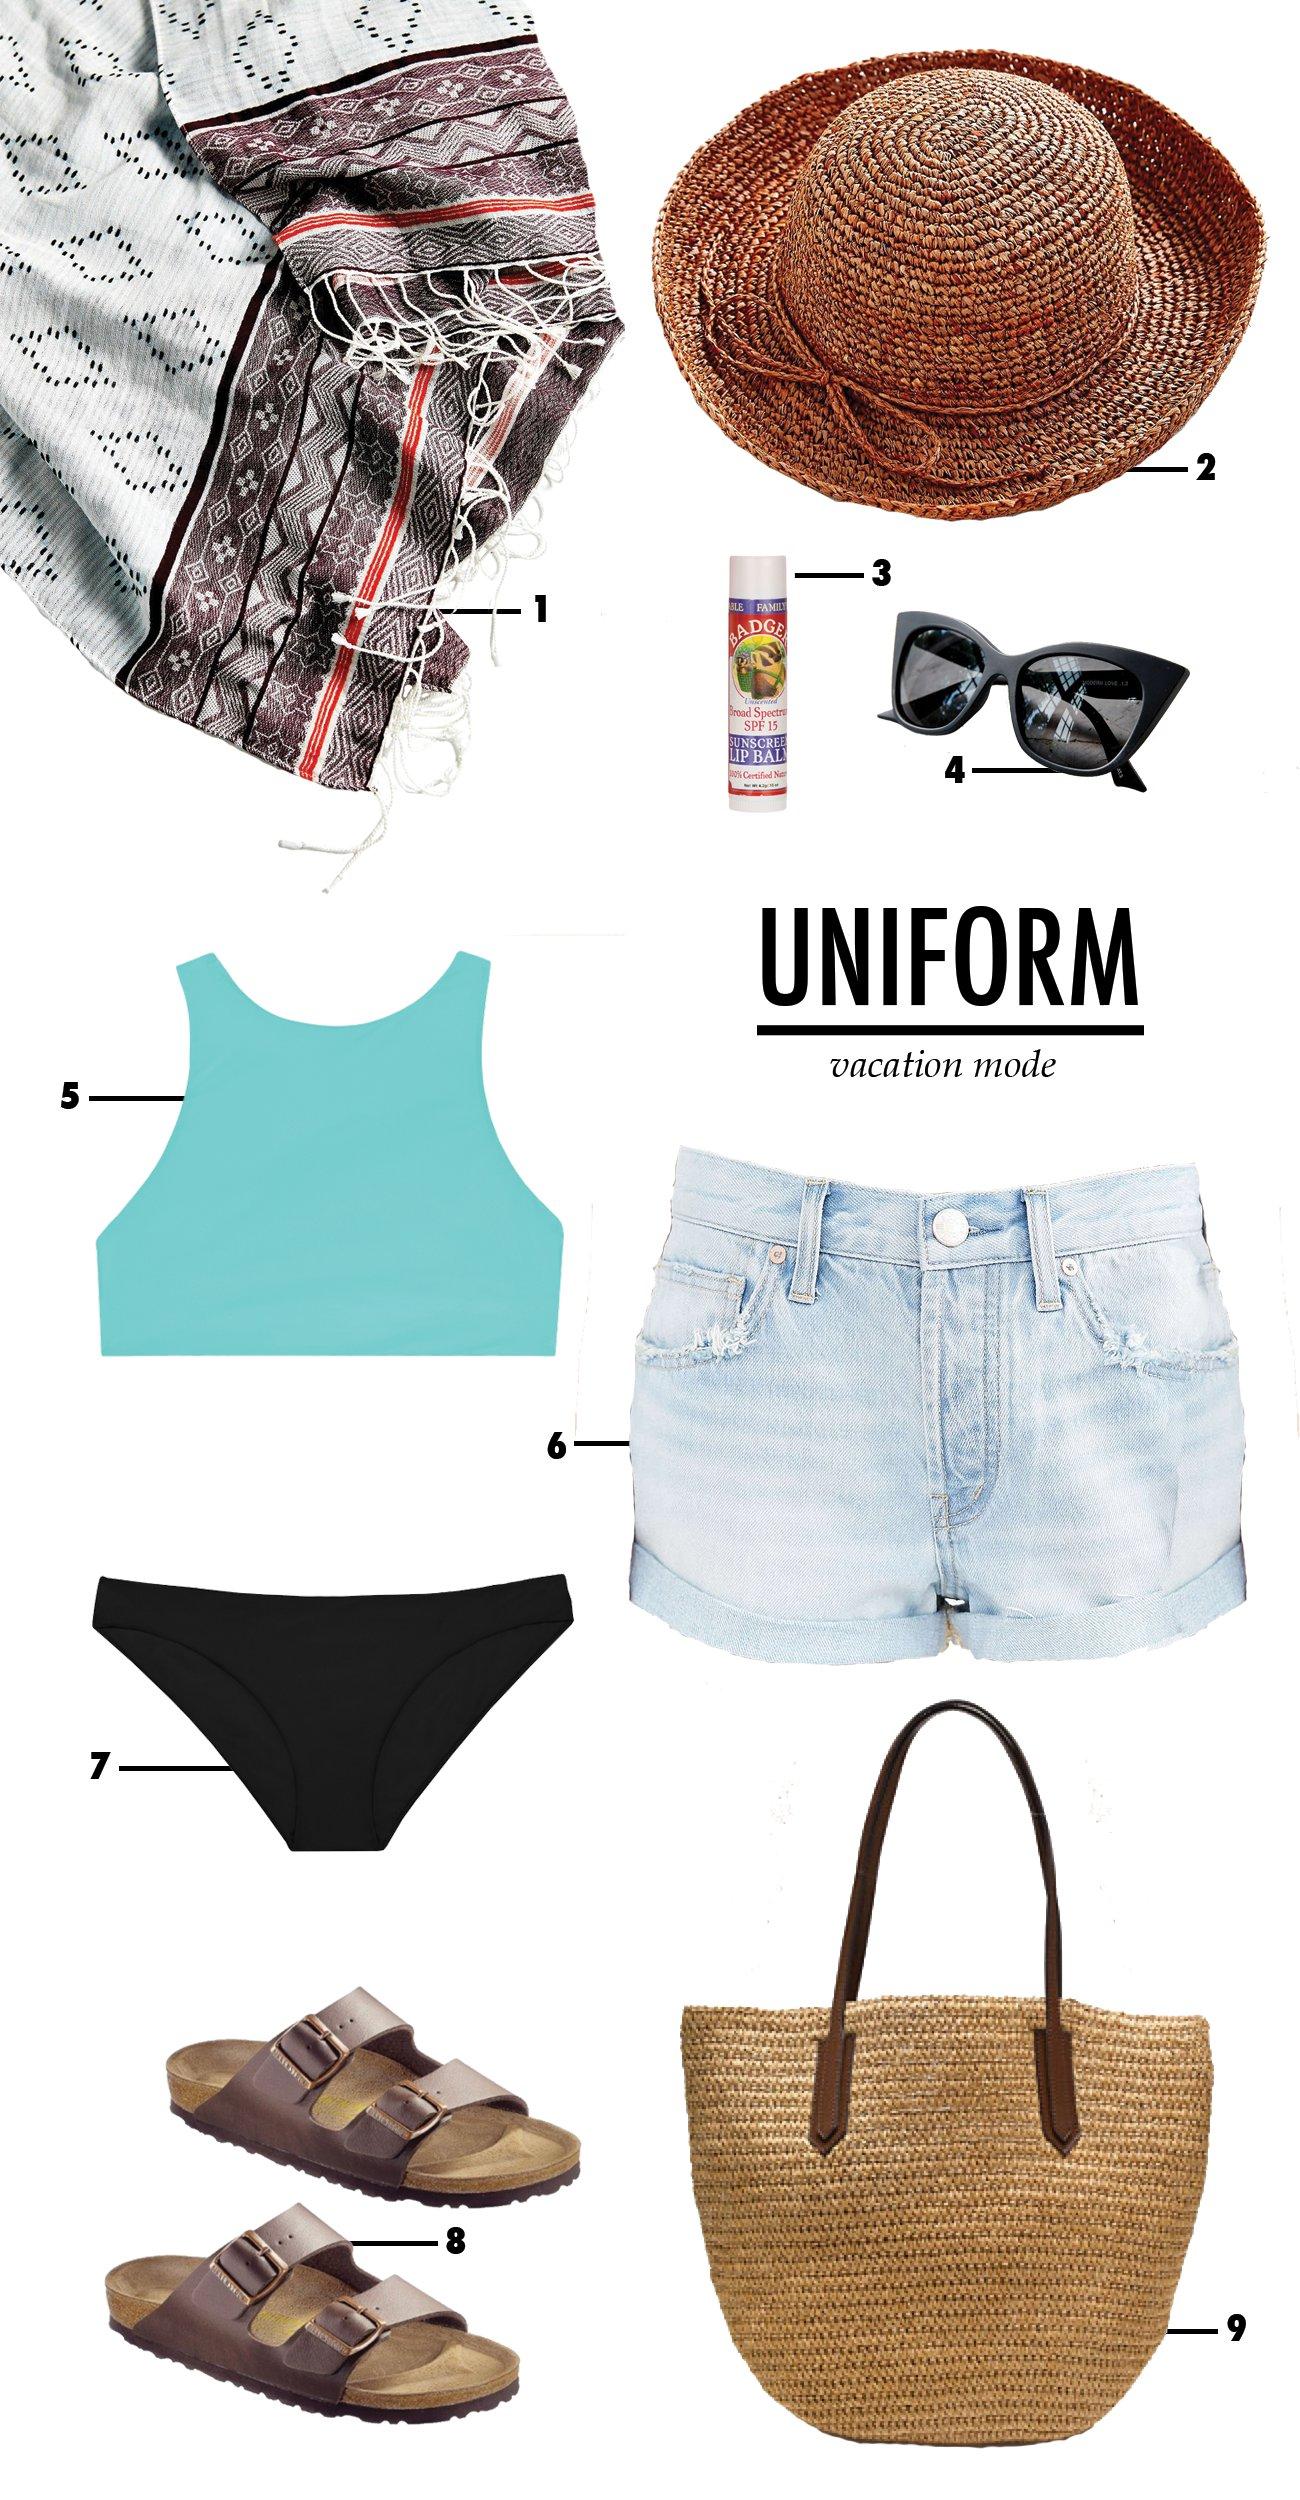 uniform-set on vacation mode